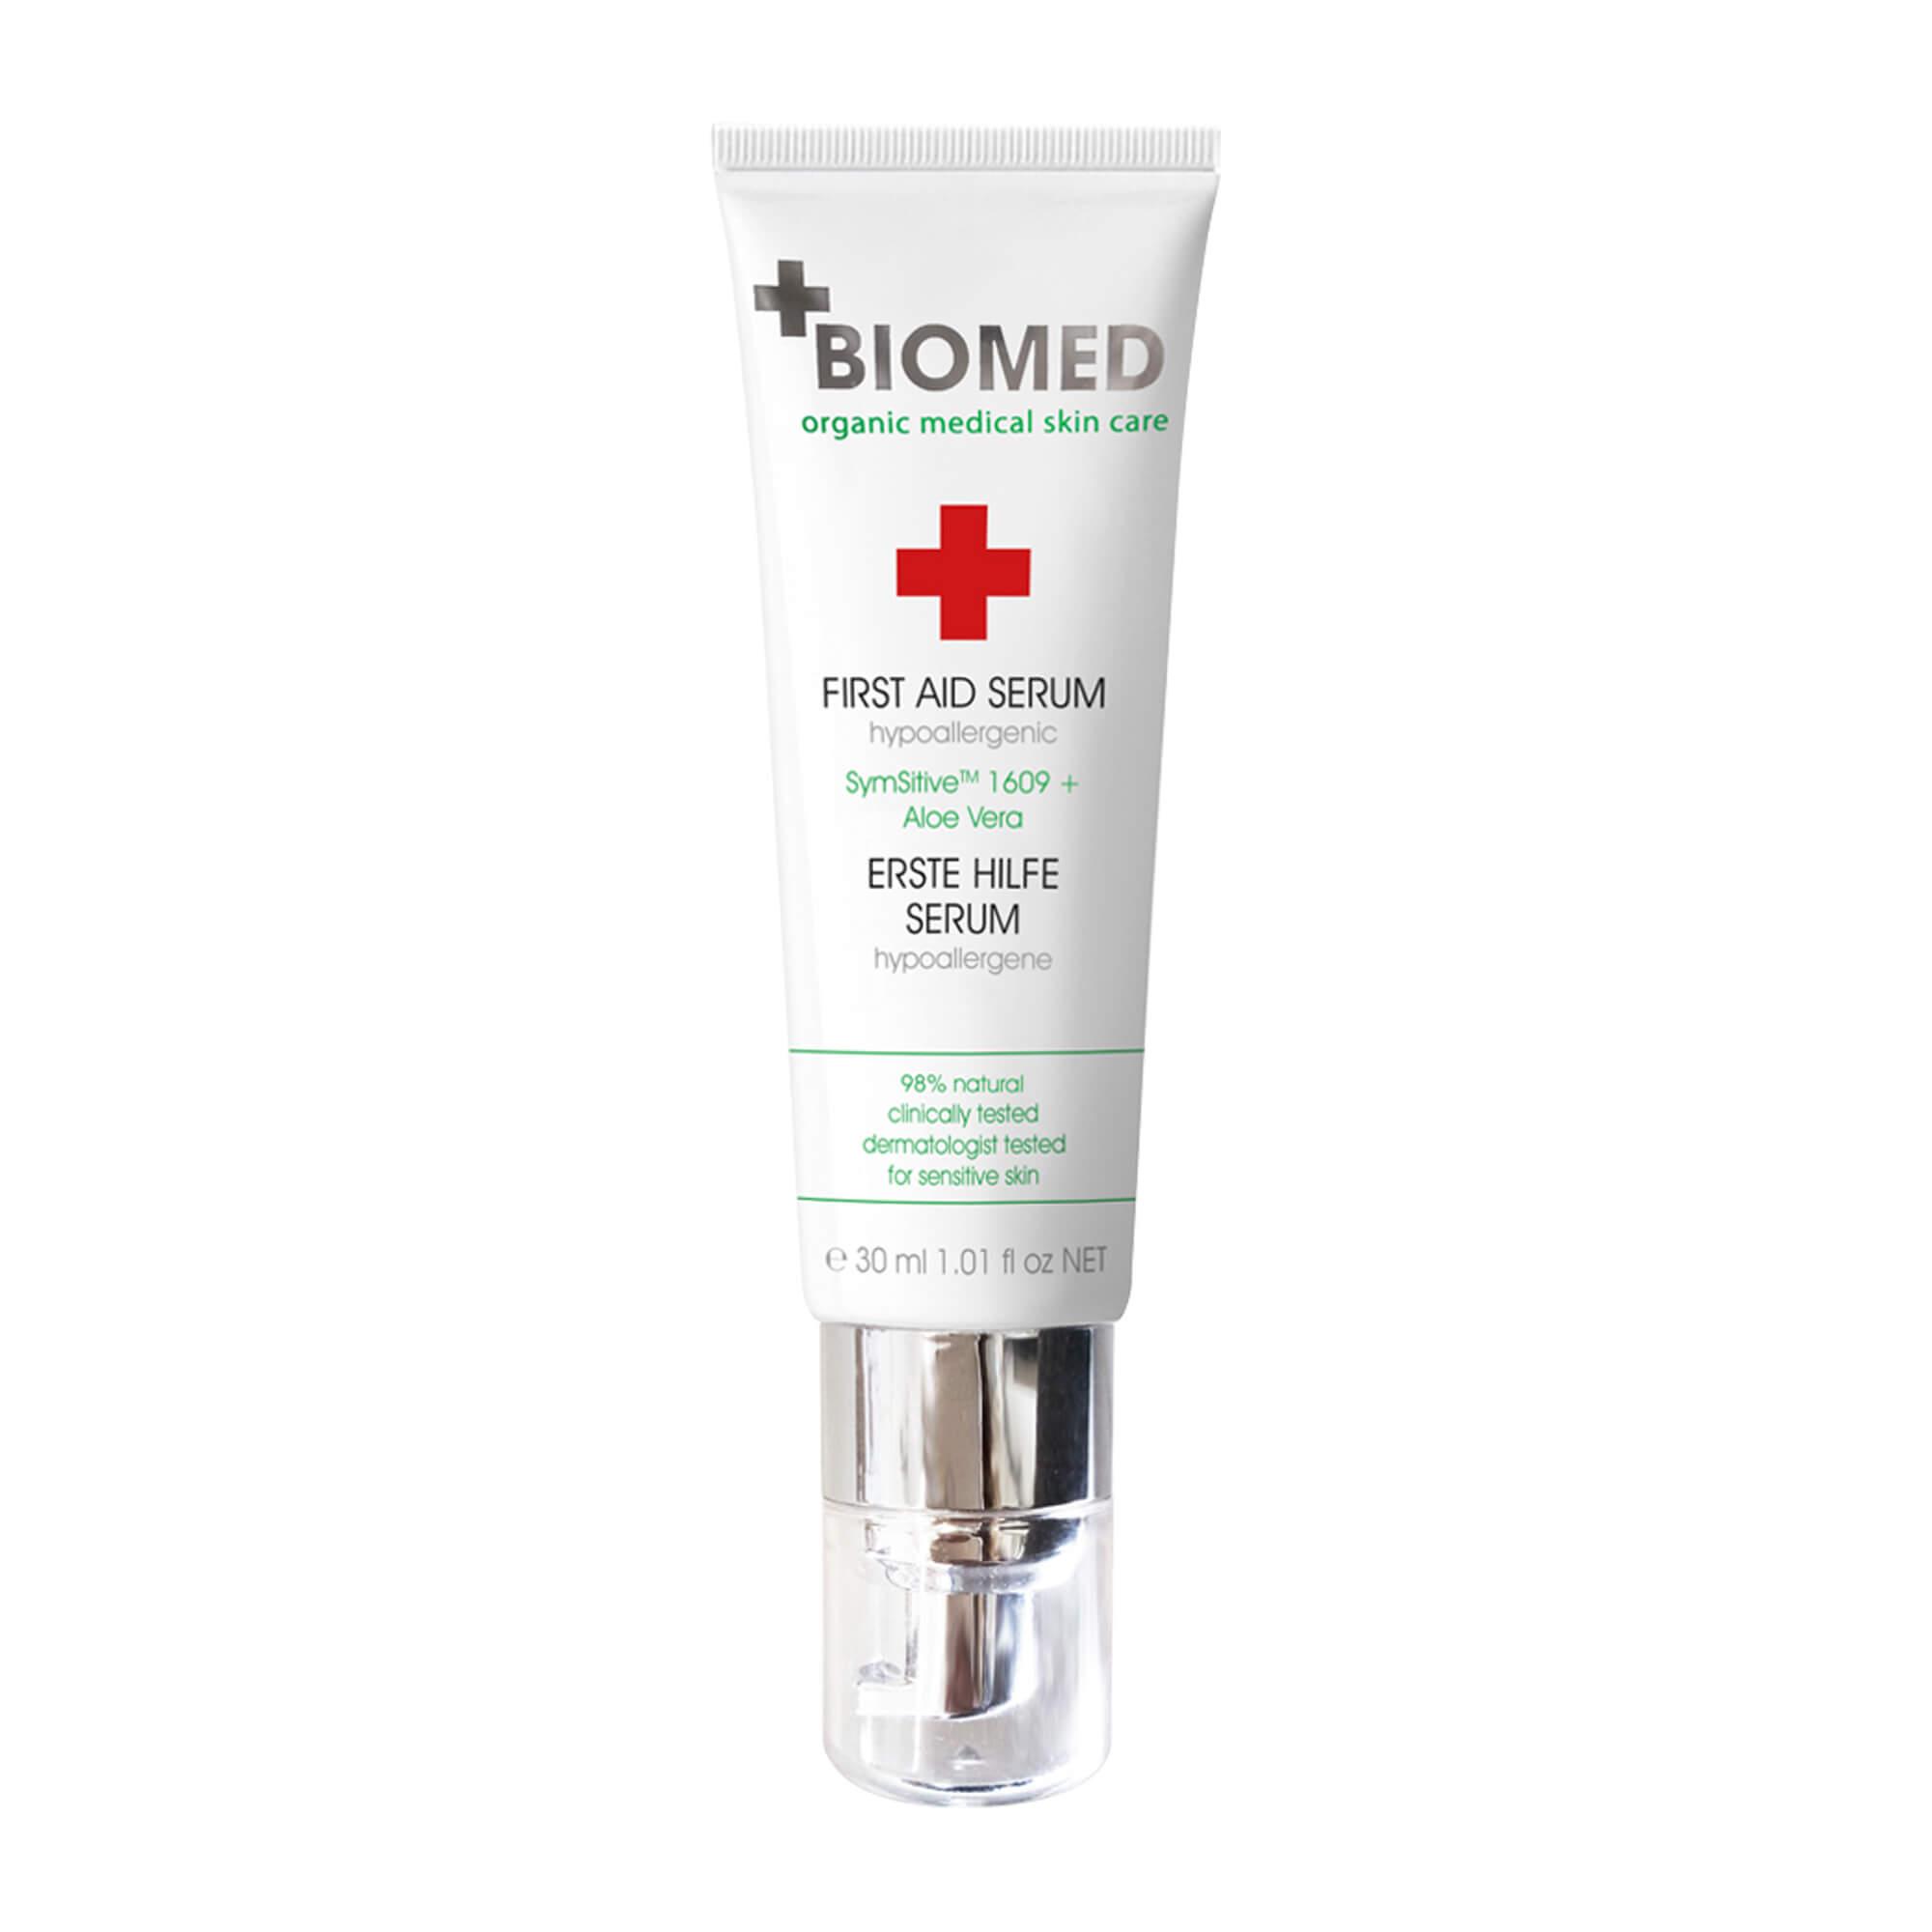 BIOMED Erste Hilfe Hypoallergenes Serum